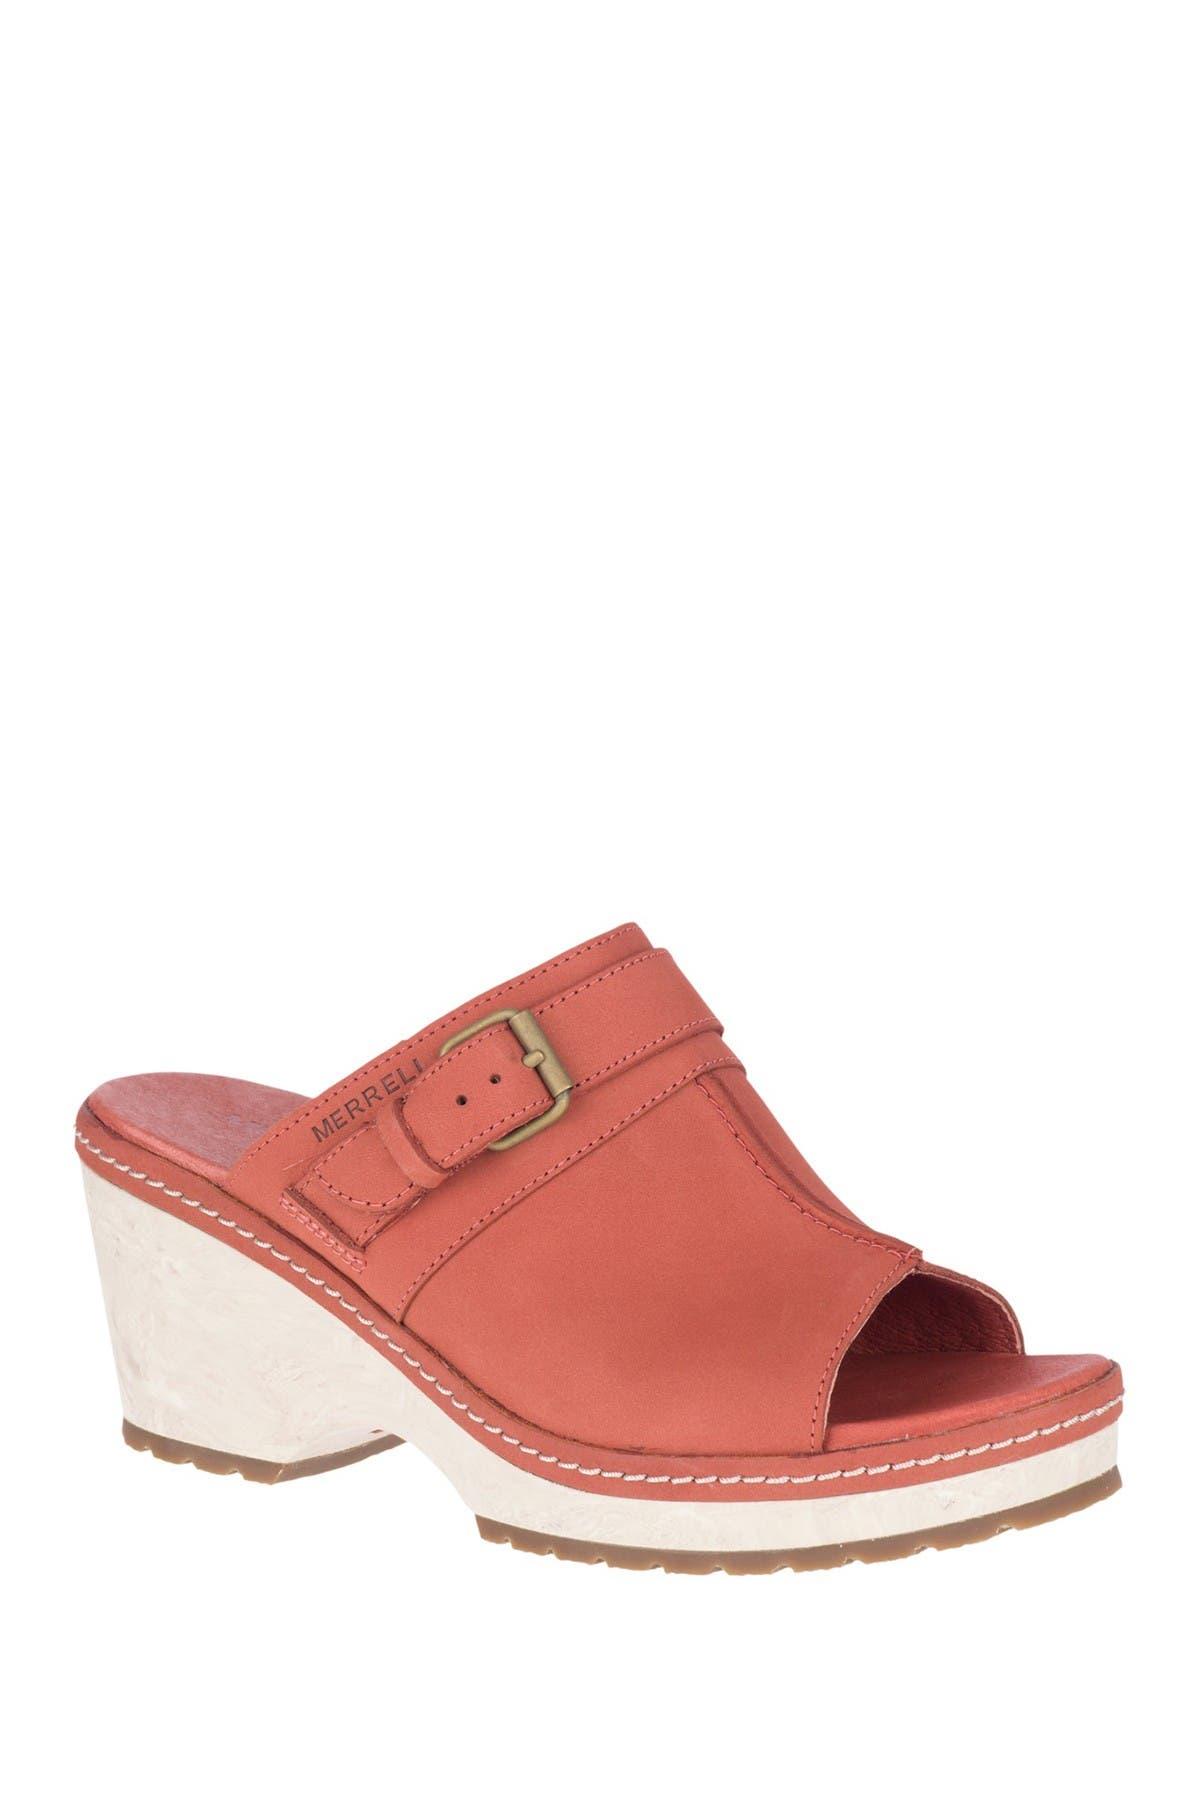 Image of Merrell Halendi Slide Leather Sandal